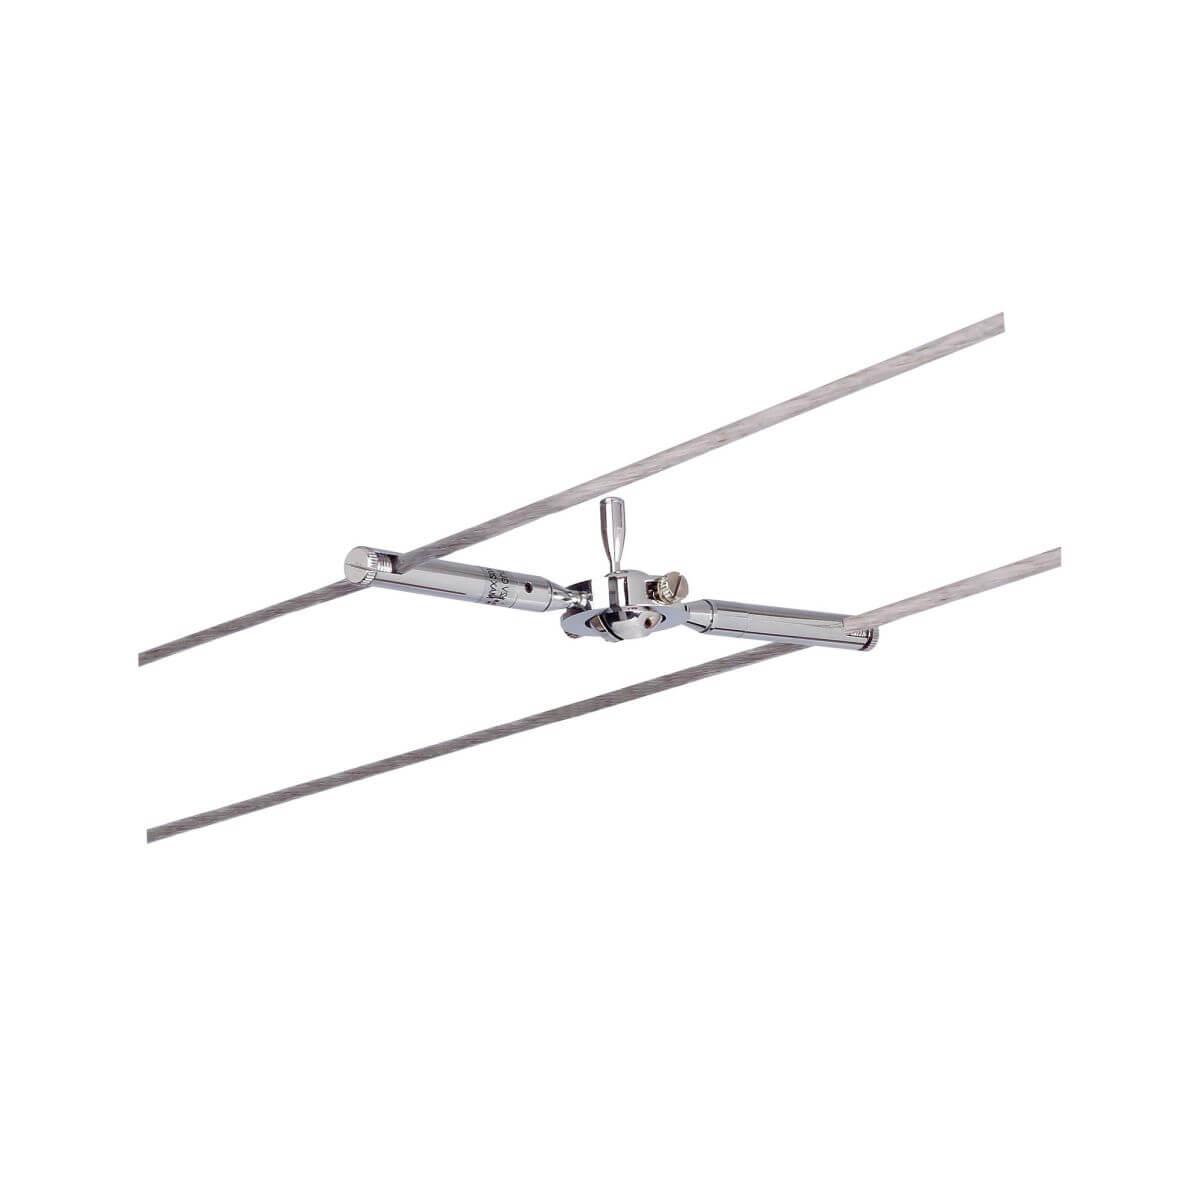 Paulmann Seilspot Togo Chrom ohne Leuchtmittel, 12 V AC, max 10 W GU5,3